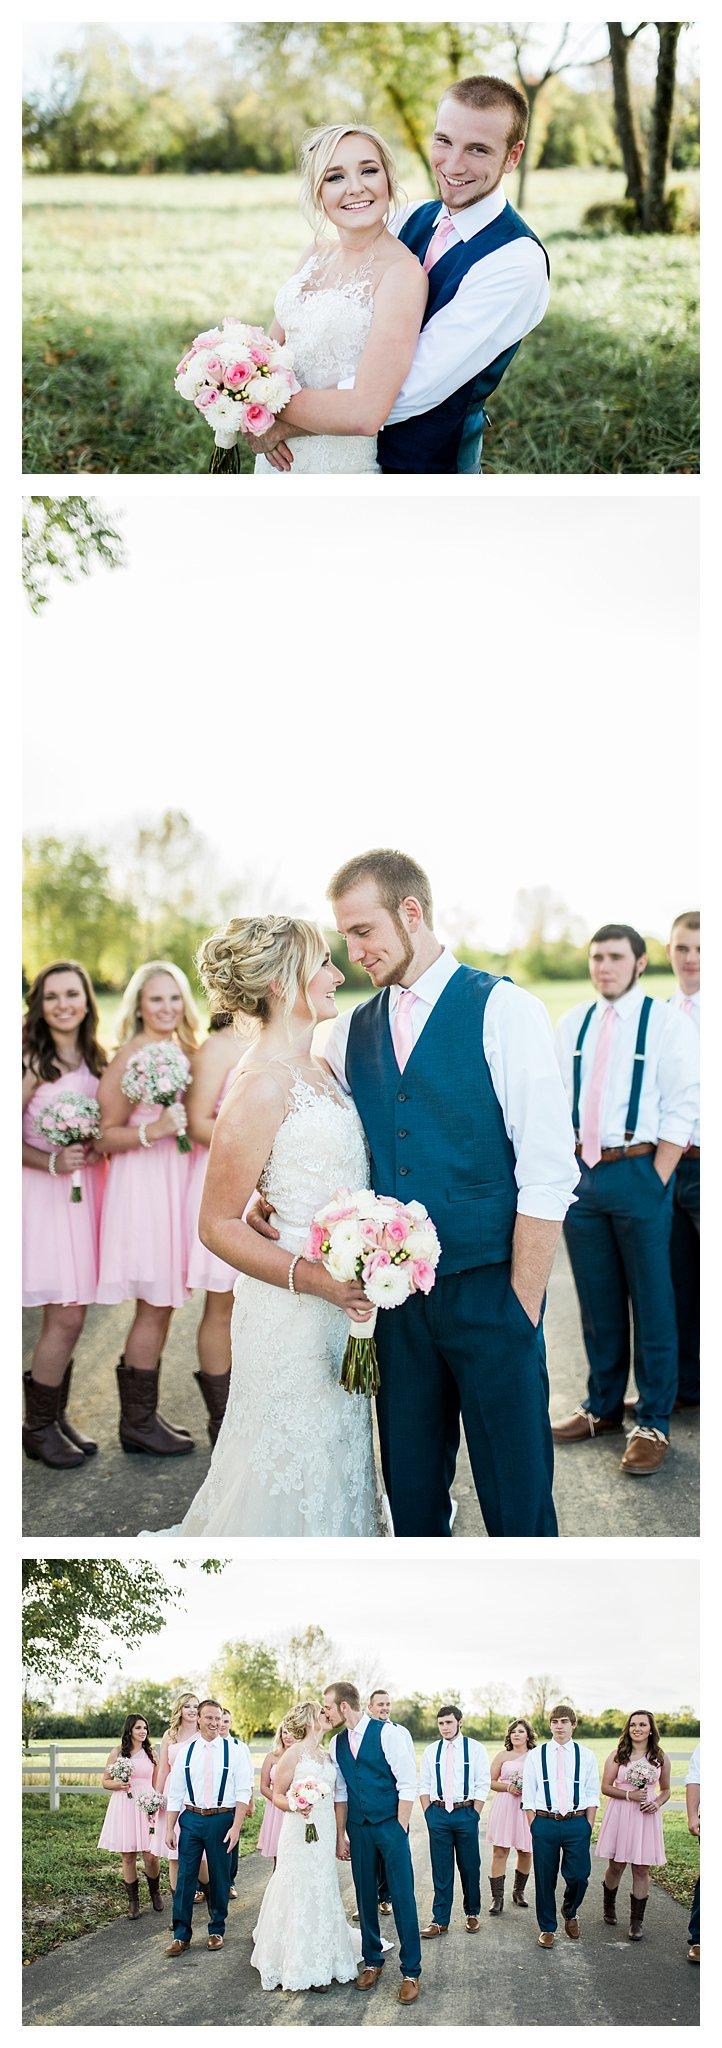 everleigh-photography-cincinnati-wedding-photographer-rolling-meadows-ranch-cincinnati-wedding-photography-wedding-photo-ideas-kristin-and-keegan30